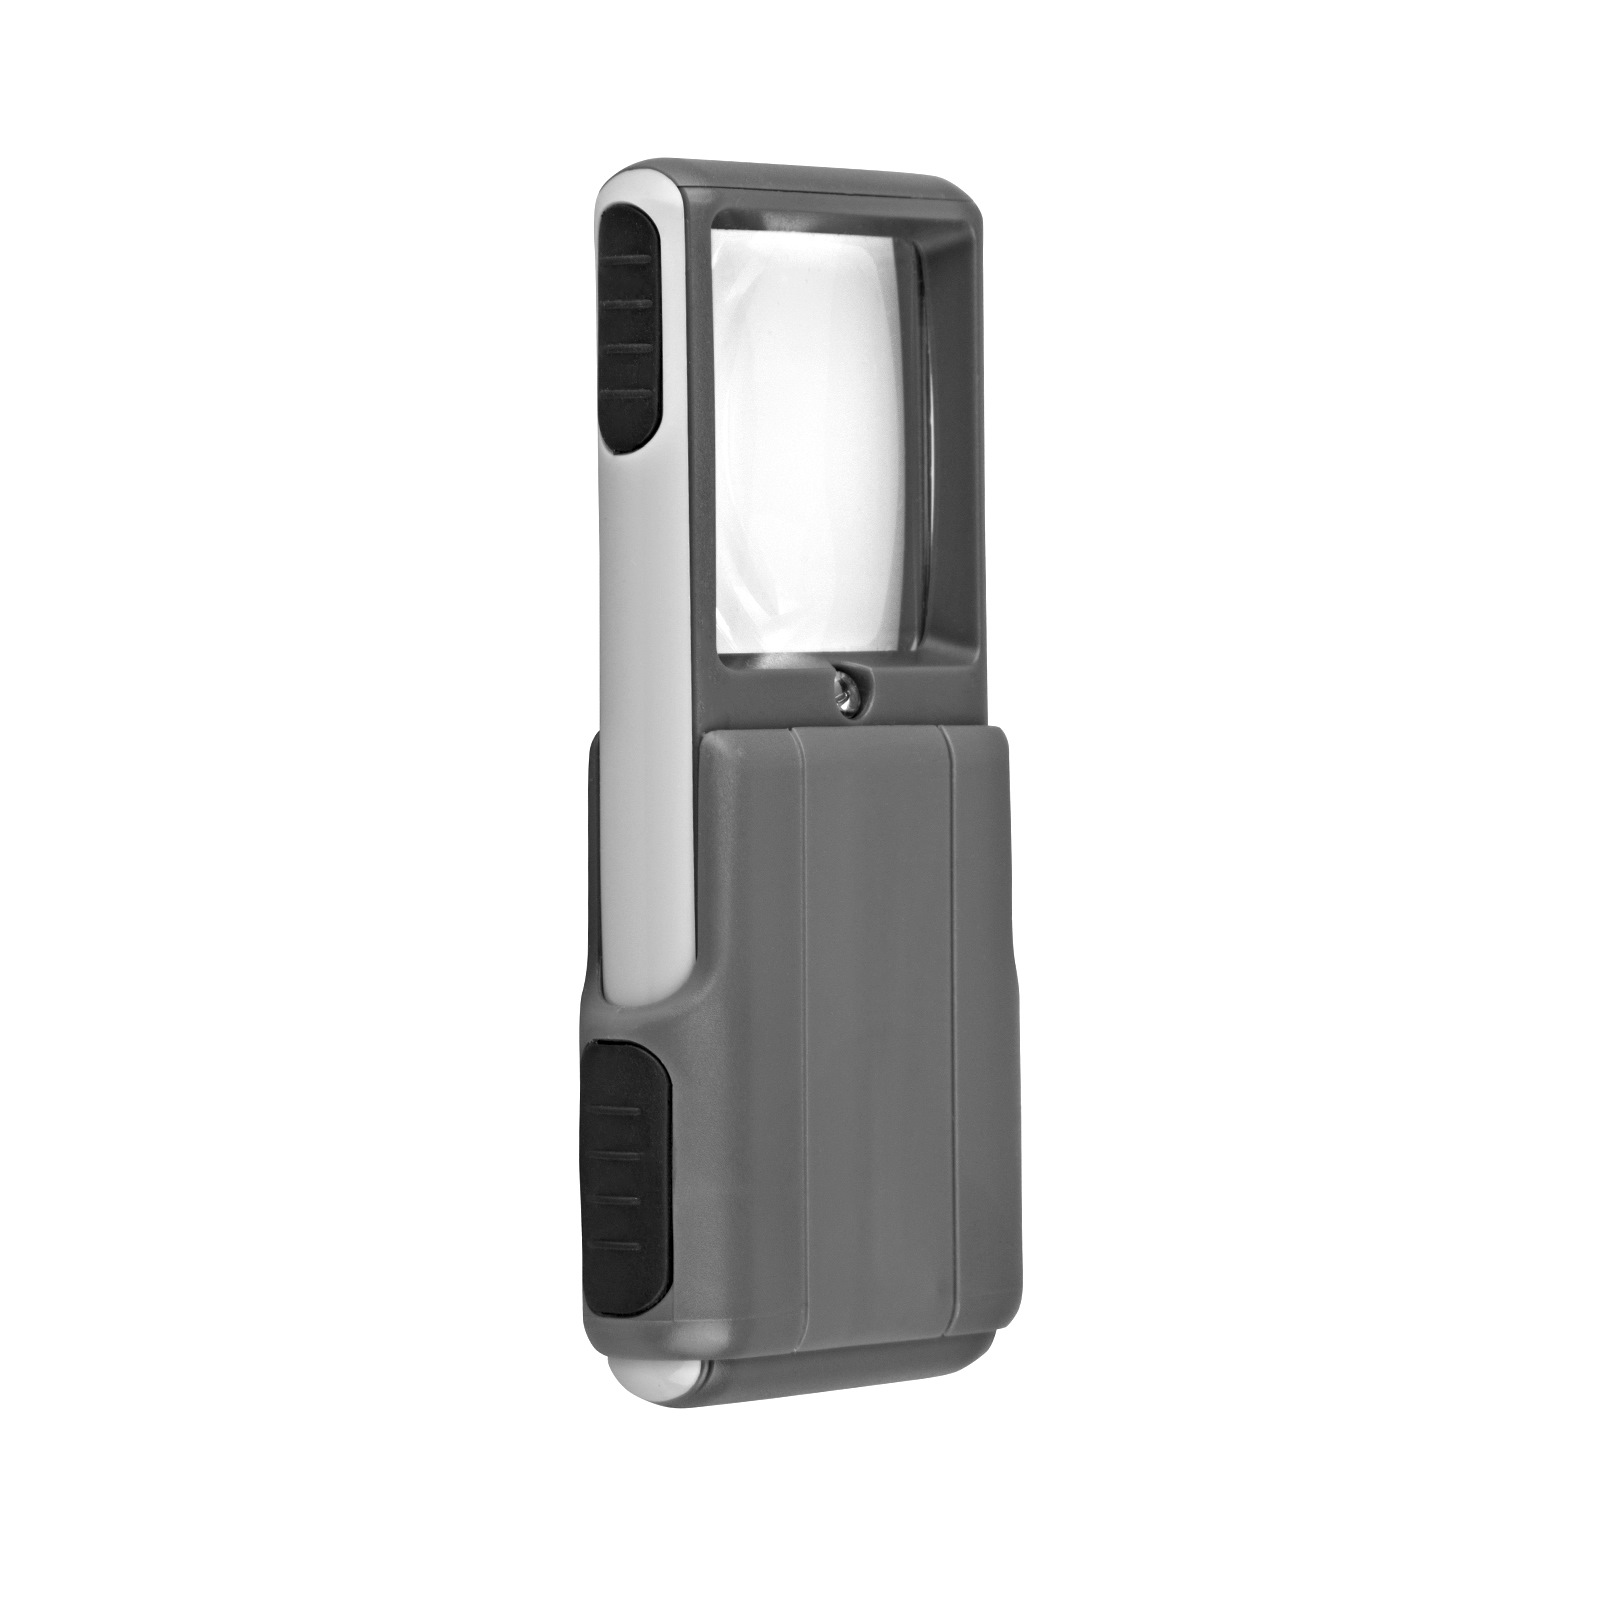 RadioShack Sliding Illuminated Magnifier (Gray)